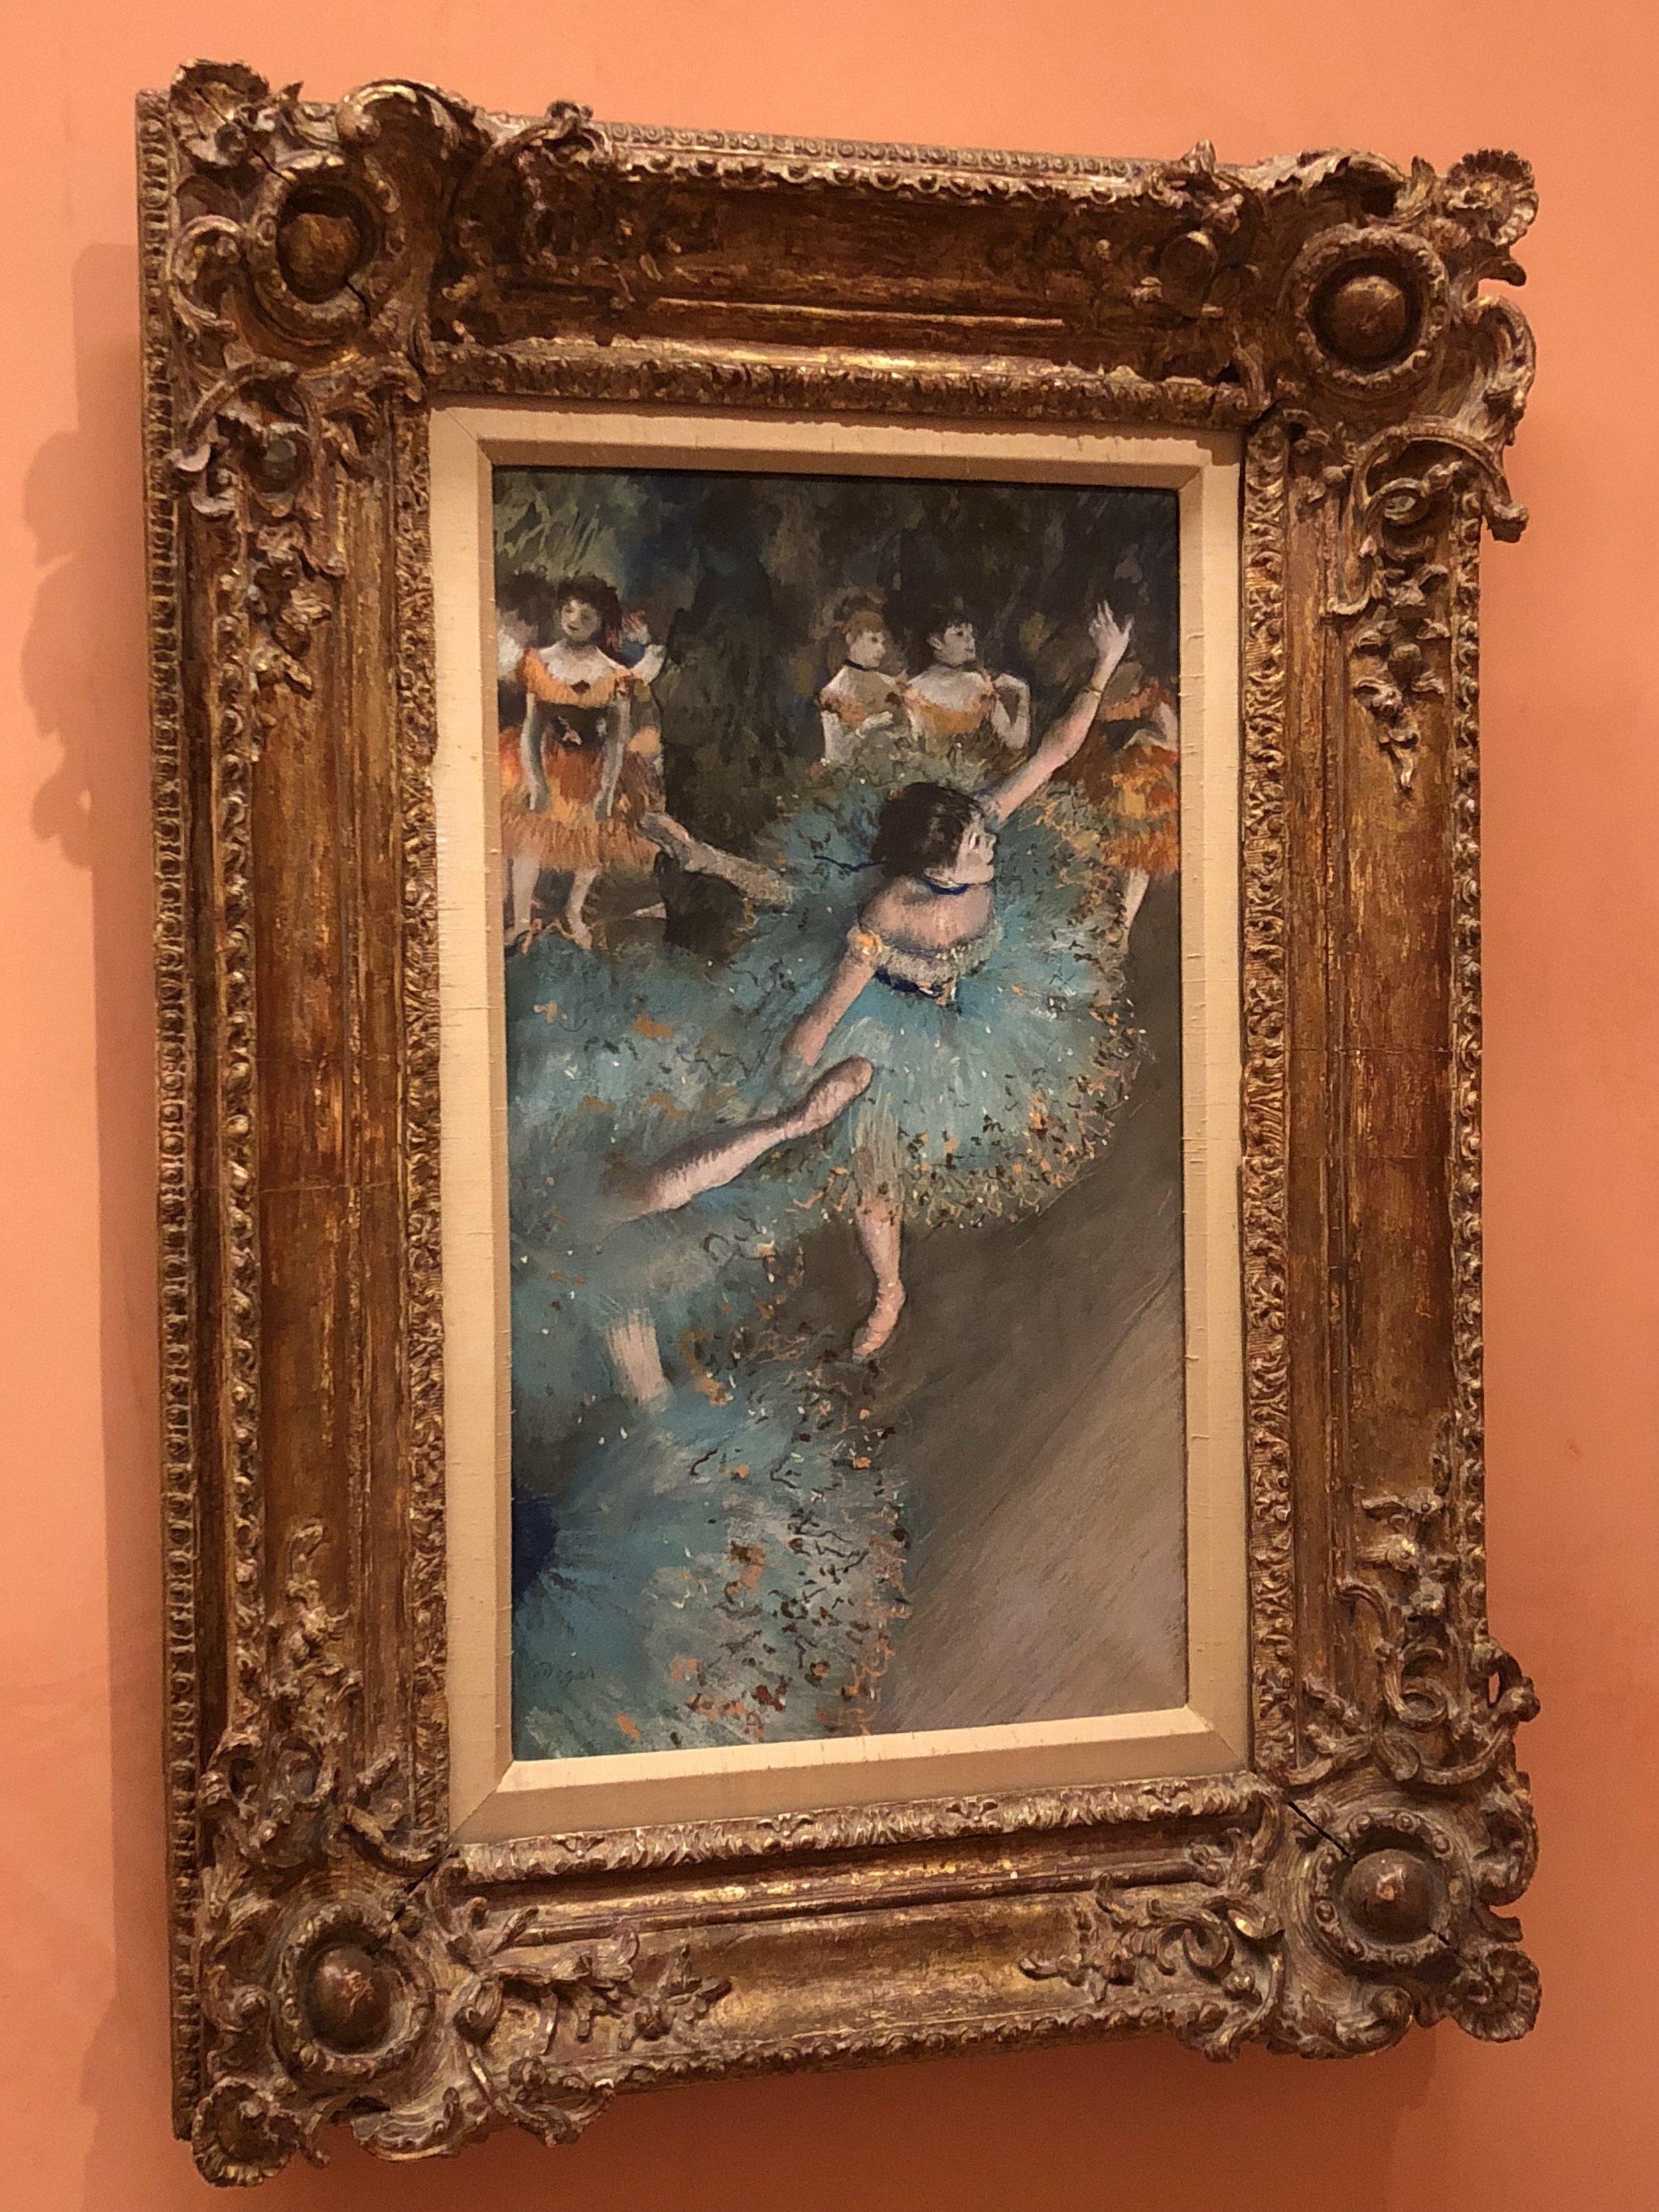 Edgar Degas  Swaying Dancer (Dancer in Green), 1877-1879